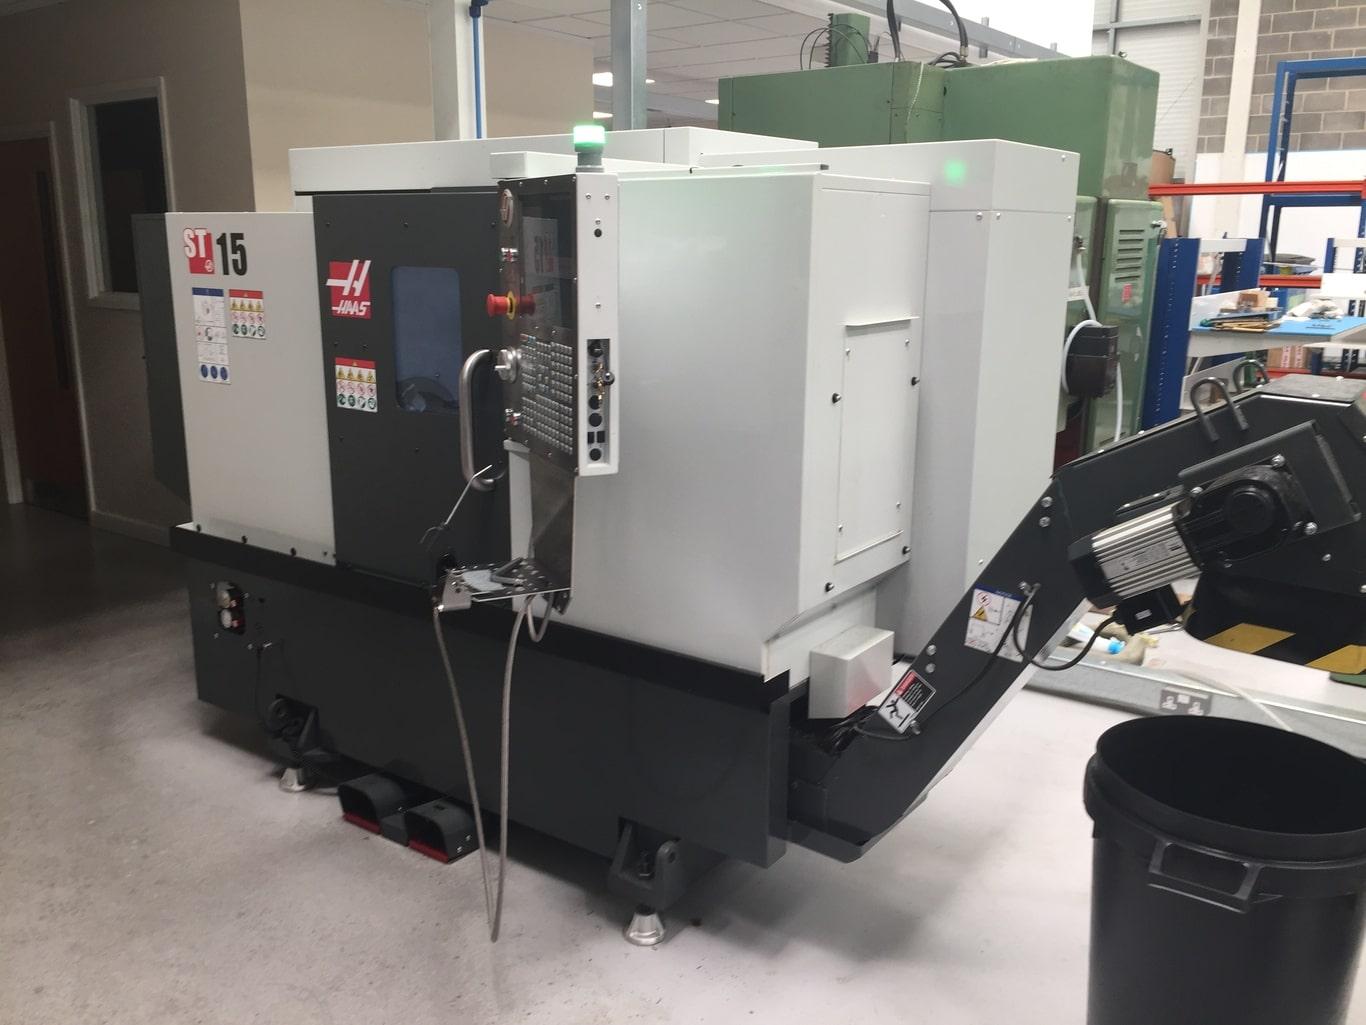 Haas ST15 CNC machining centre